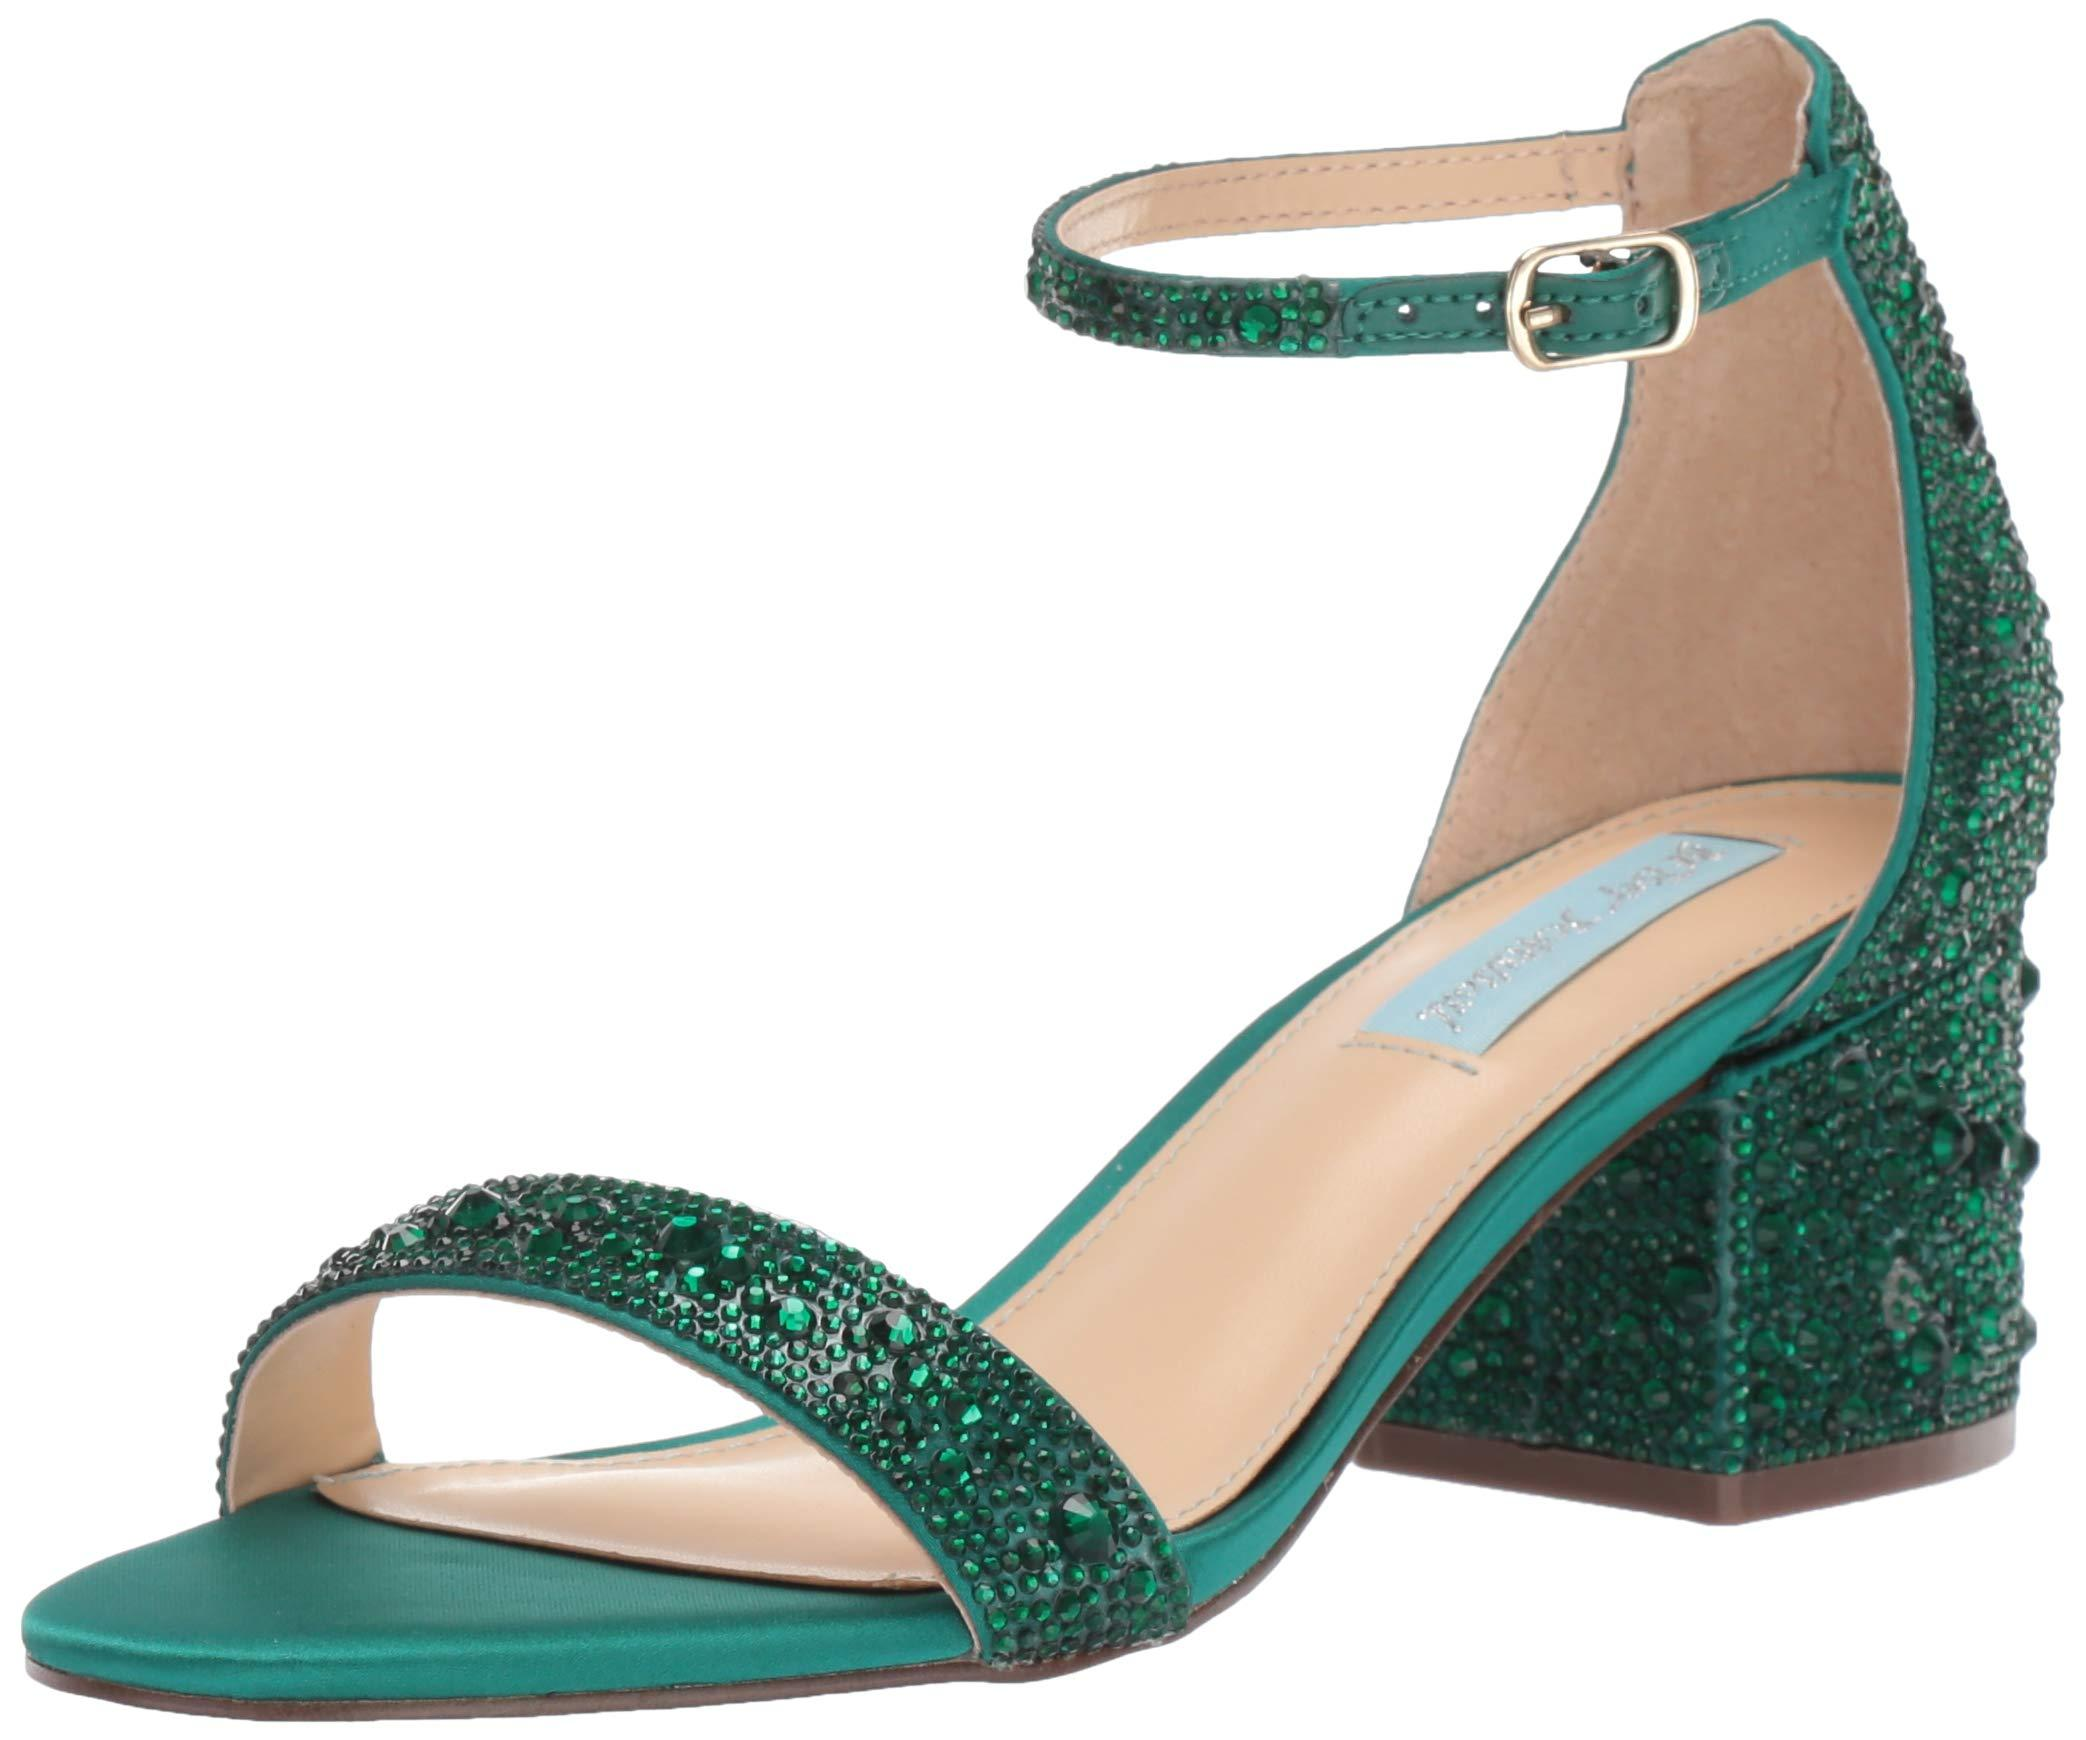 Betsey Johnson Blue Sb-rina Heeled Sandal - Lyst